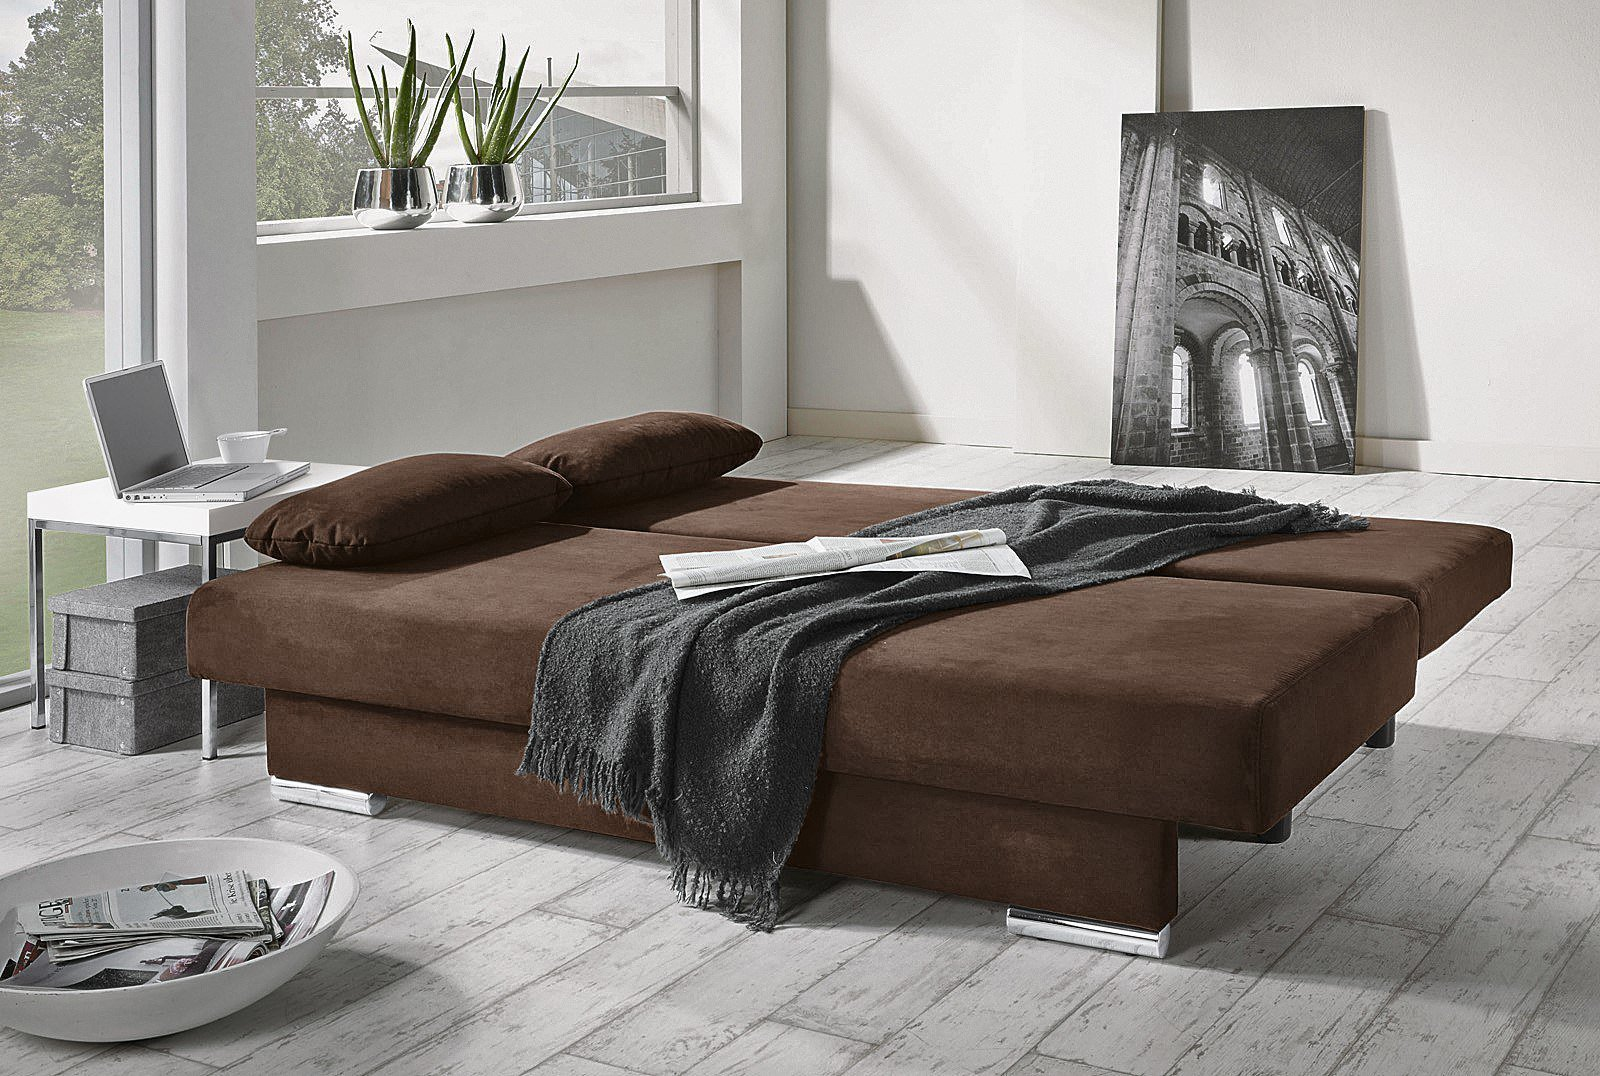 jockenh fer griffin angel schlafsofa inklusive bettkasten m bel letz ihr online shop. Black Bedroom Furniture Sets. Home Design Ideas